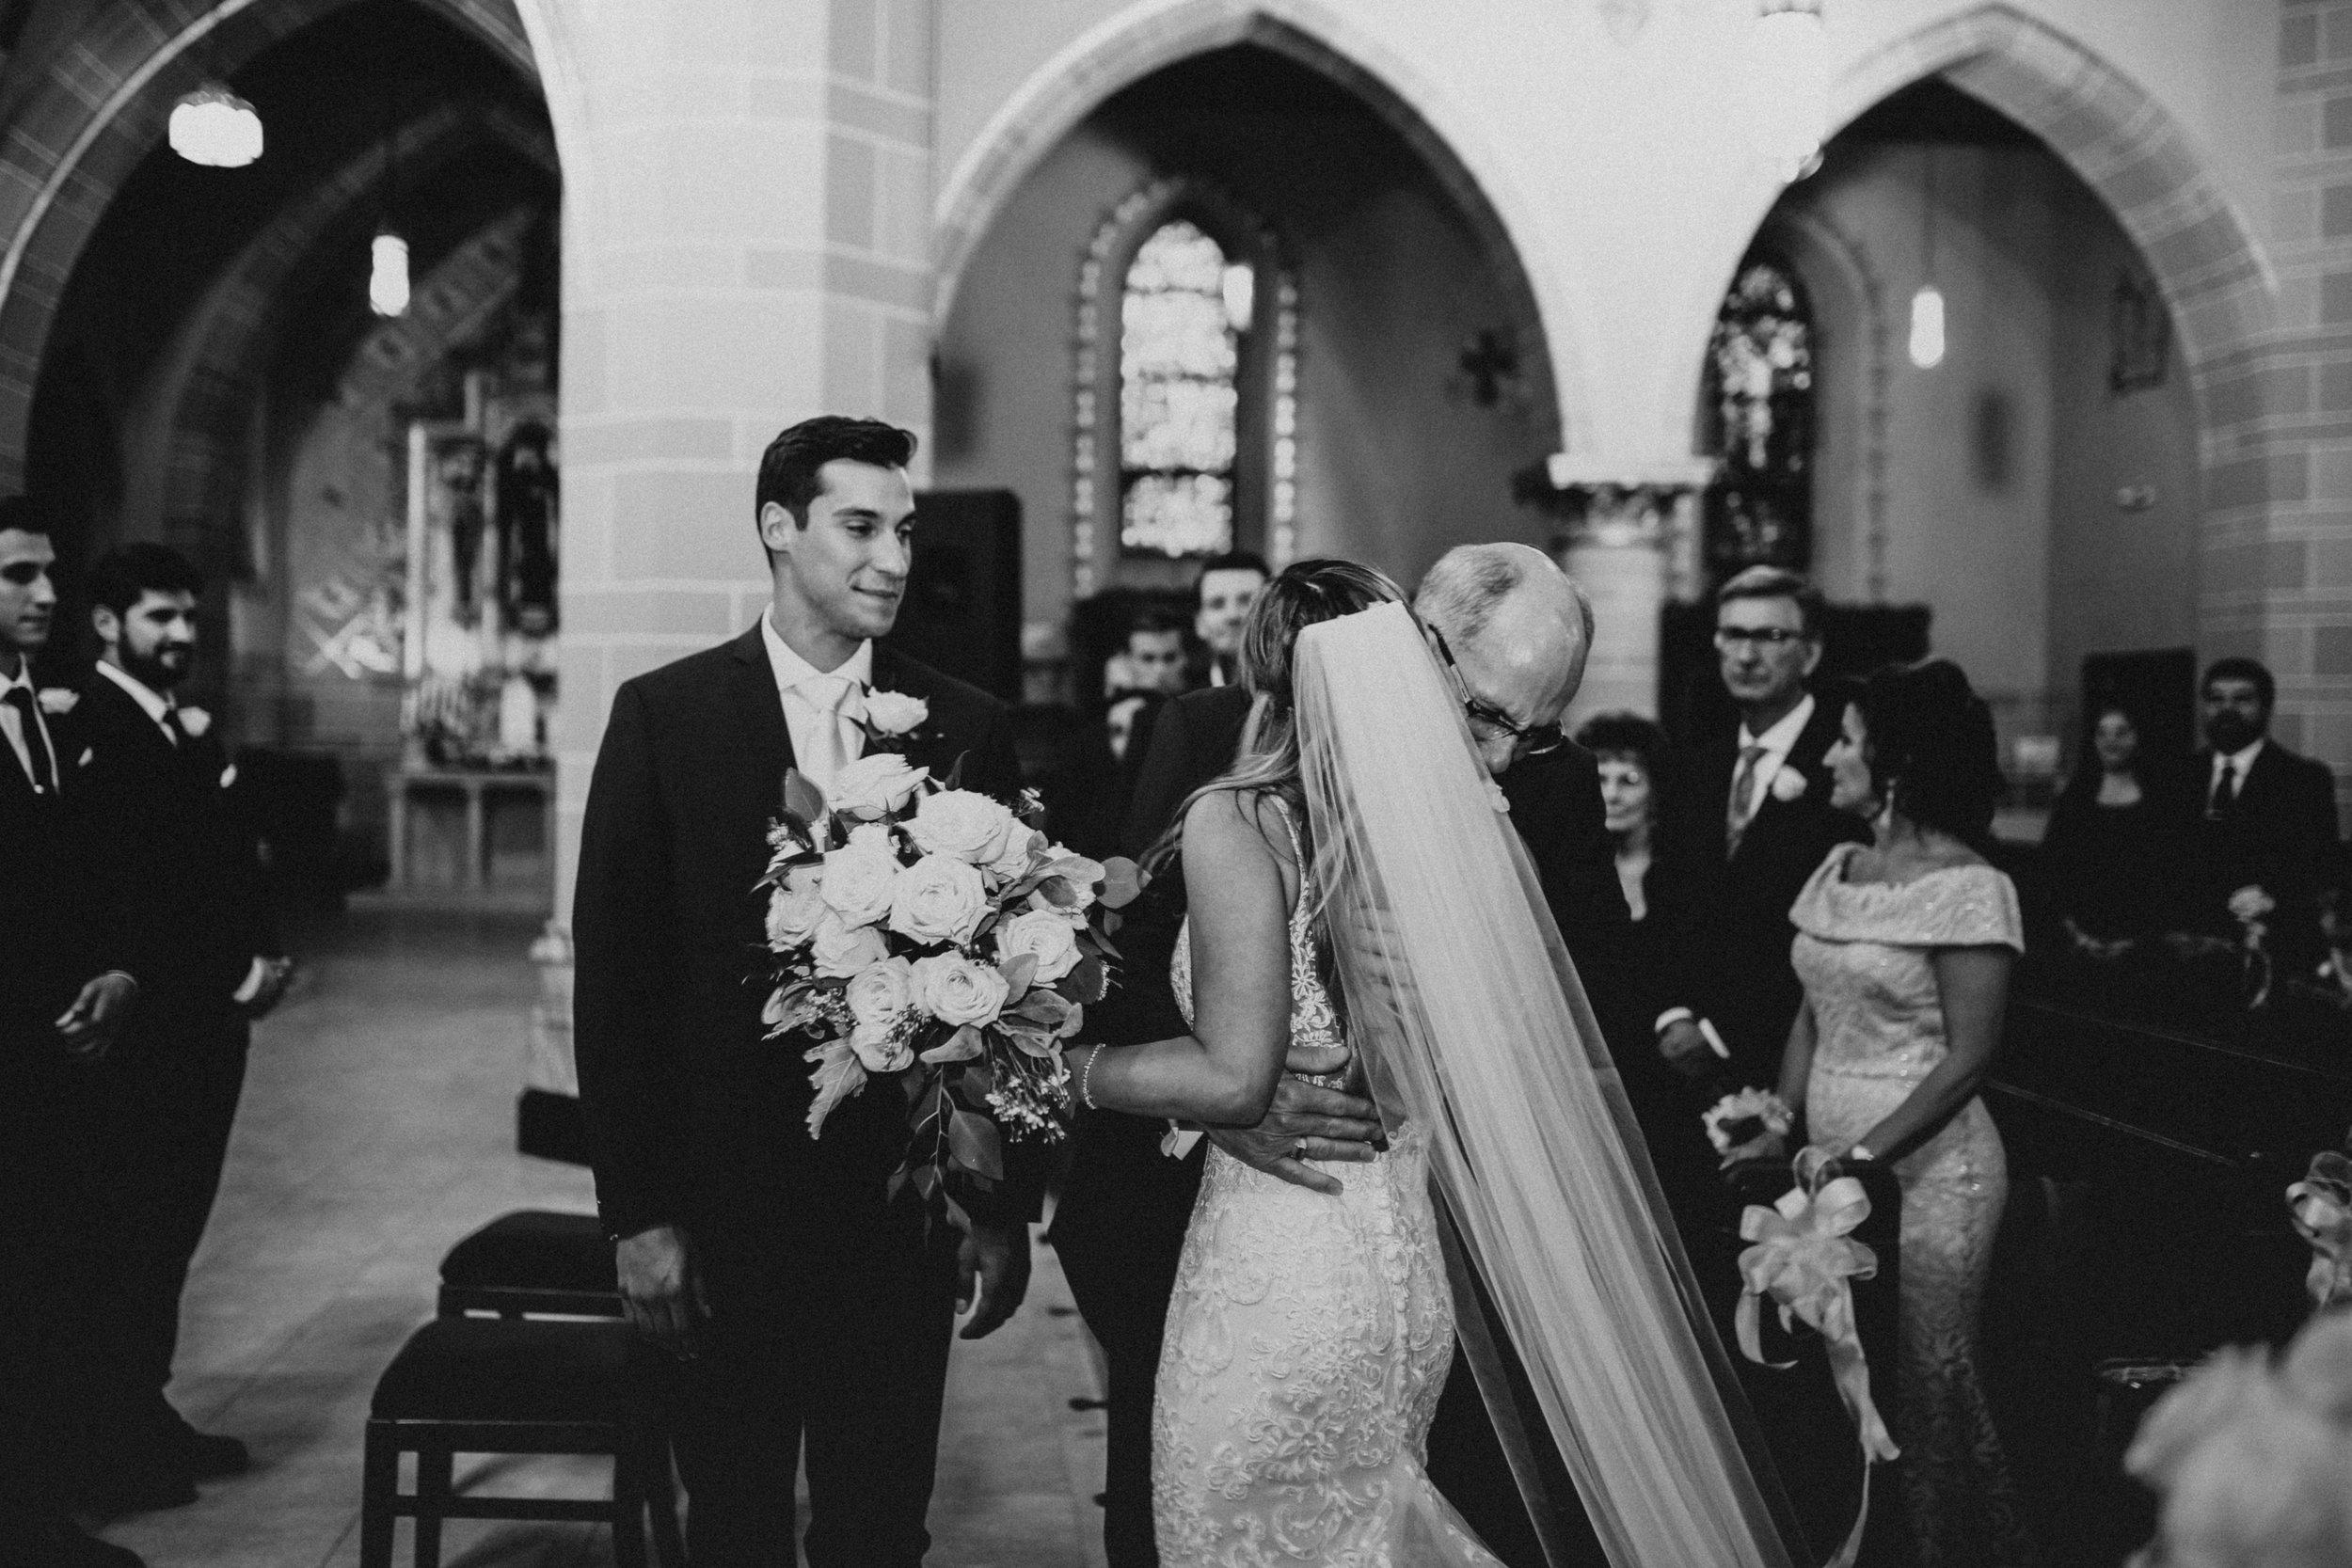 Mr+MrsSzandzik_Wedding_234.jpg